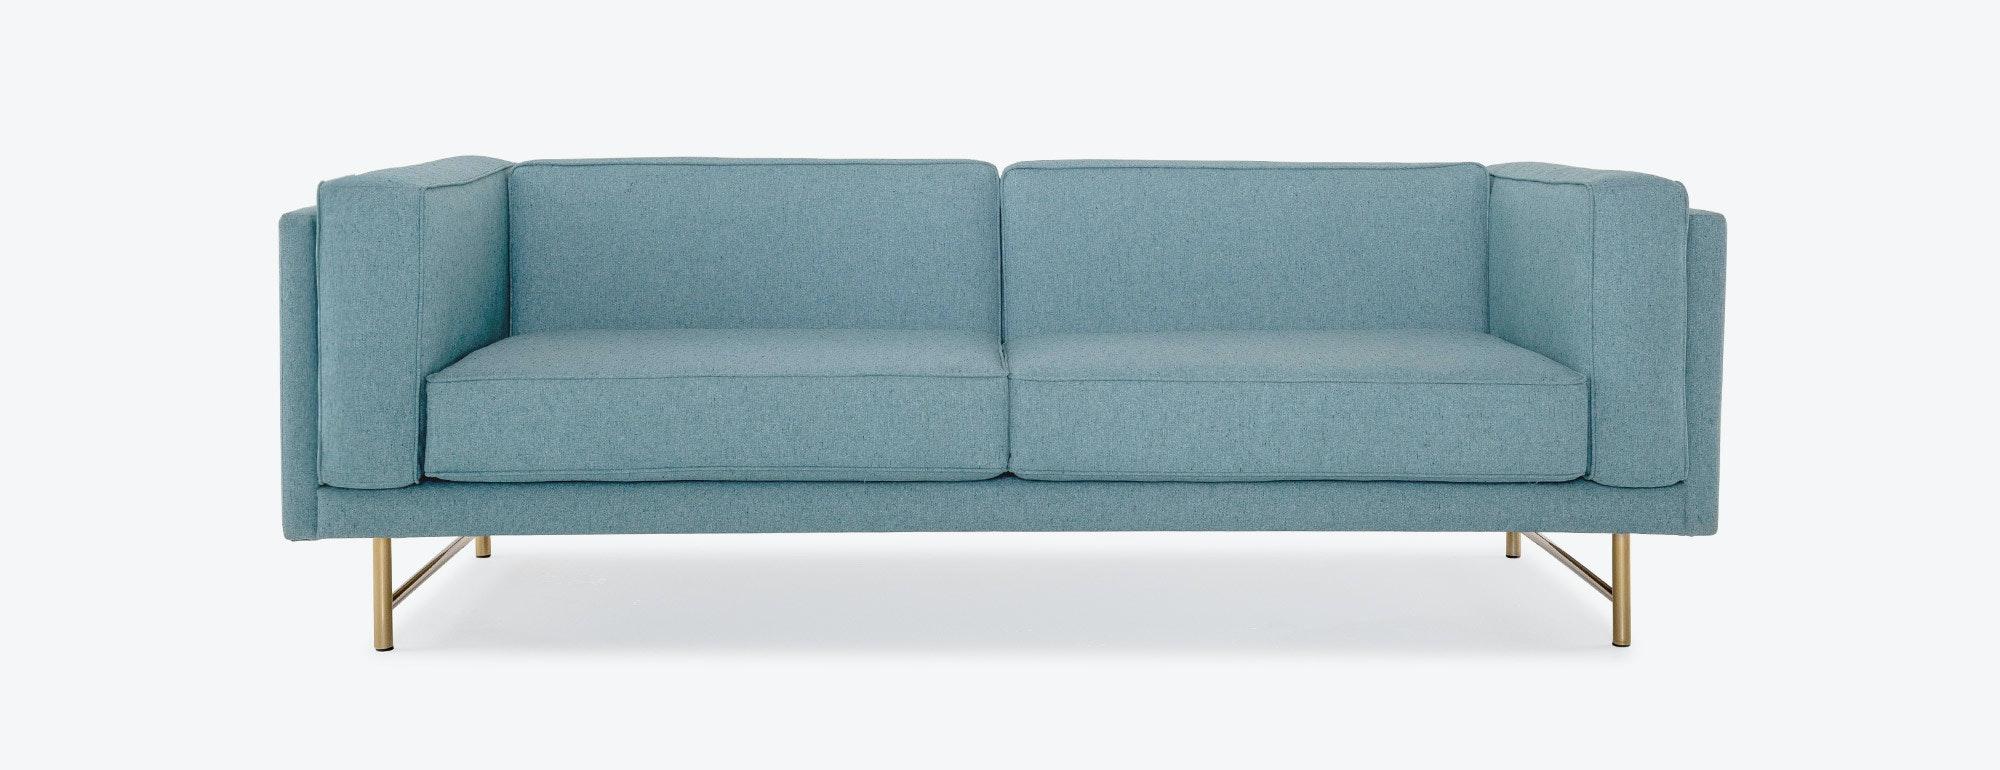 aqua sofa cama juvenil vercelli leather reclining sofas blue